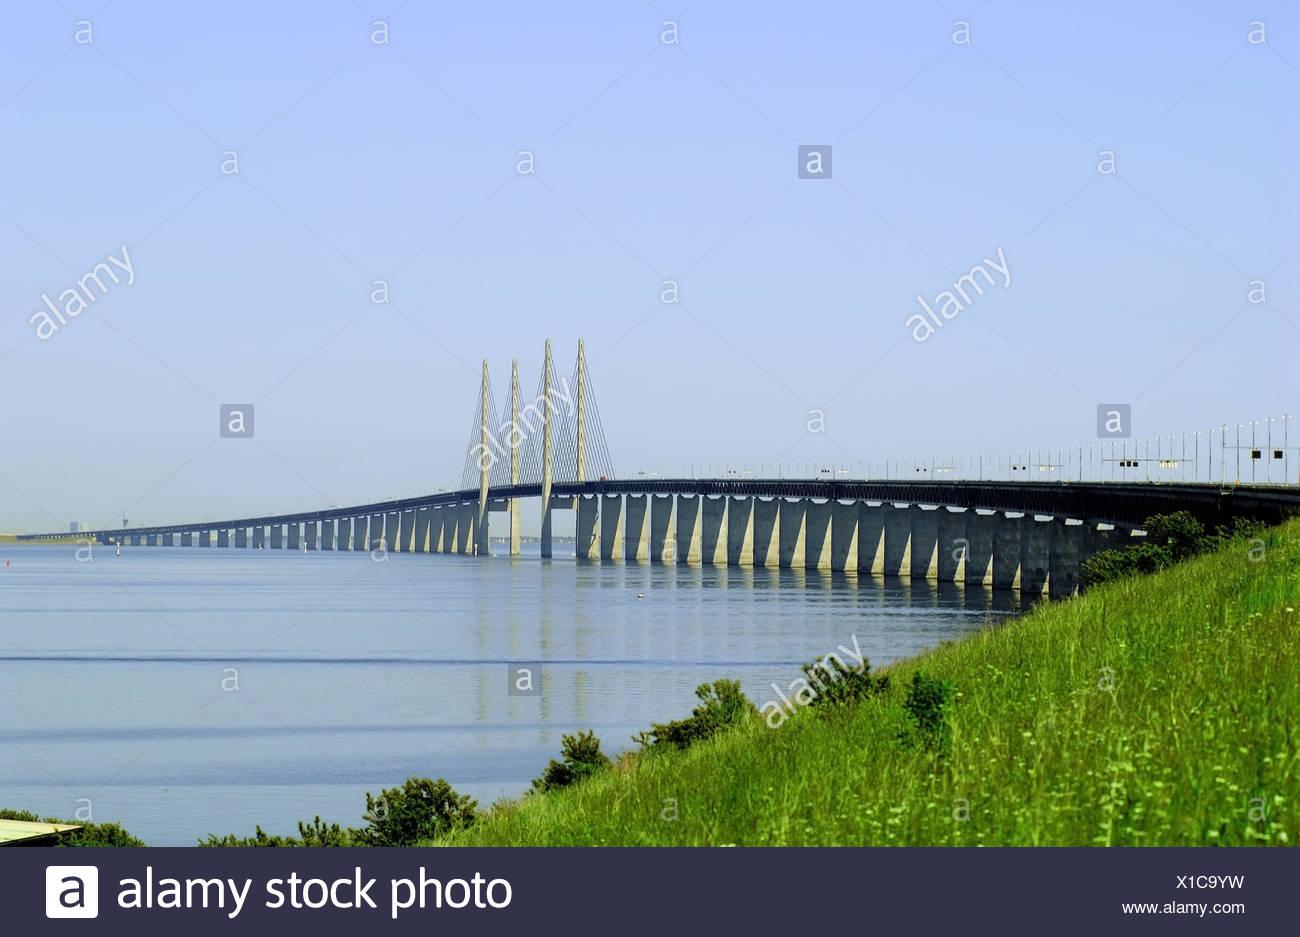 Sweden, Öresundbrücke, bridge, connection, Denmark, Swede, the Baltic Sea, the North Sea, bridge, suspension bridge, high-level bridge, Hängeseilbrücke, strait, Öresund, sound, Zealand, Malmö, bridge pier, concrete pillar, bridge construction, - Stock Image